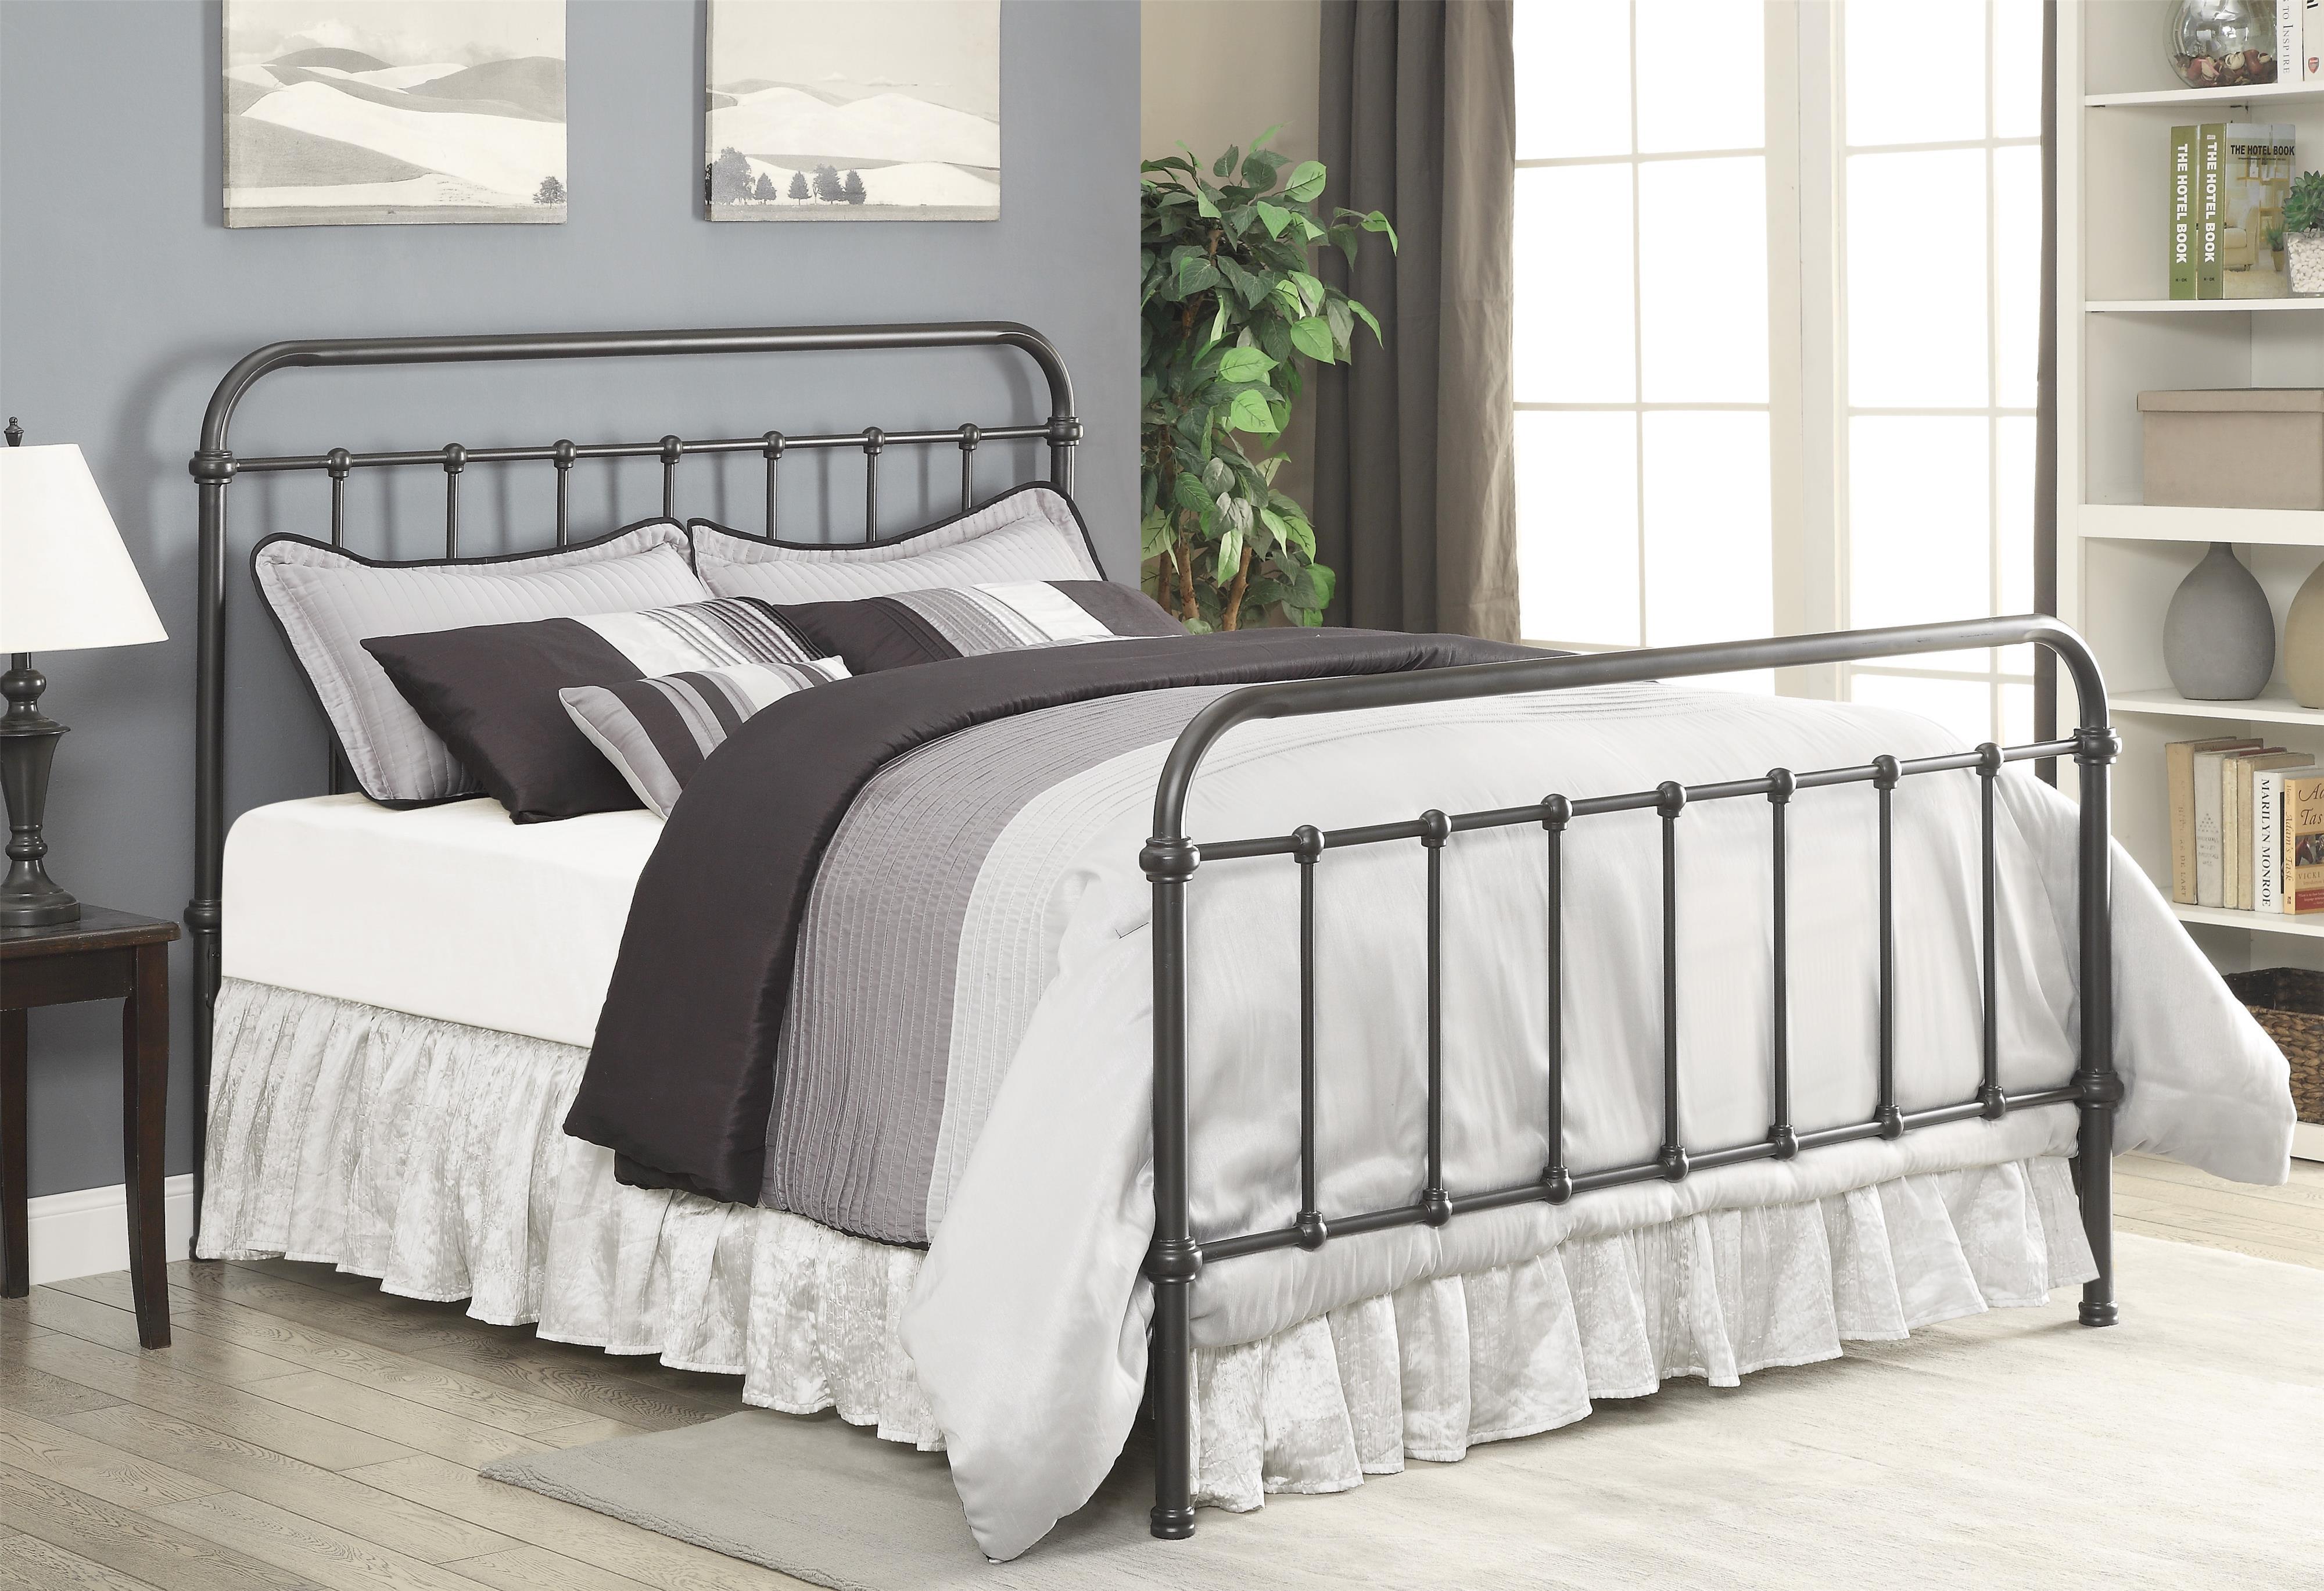 Coaster Livingston Transitional King Metal Bed   Coaster Fine Furniture